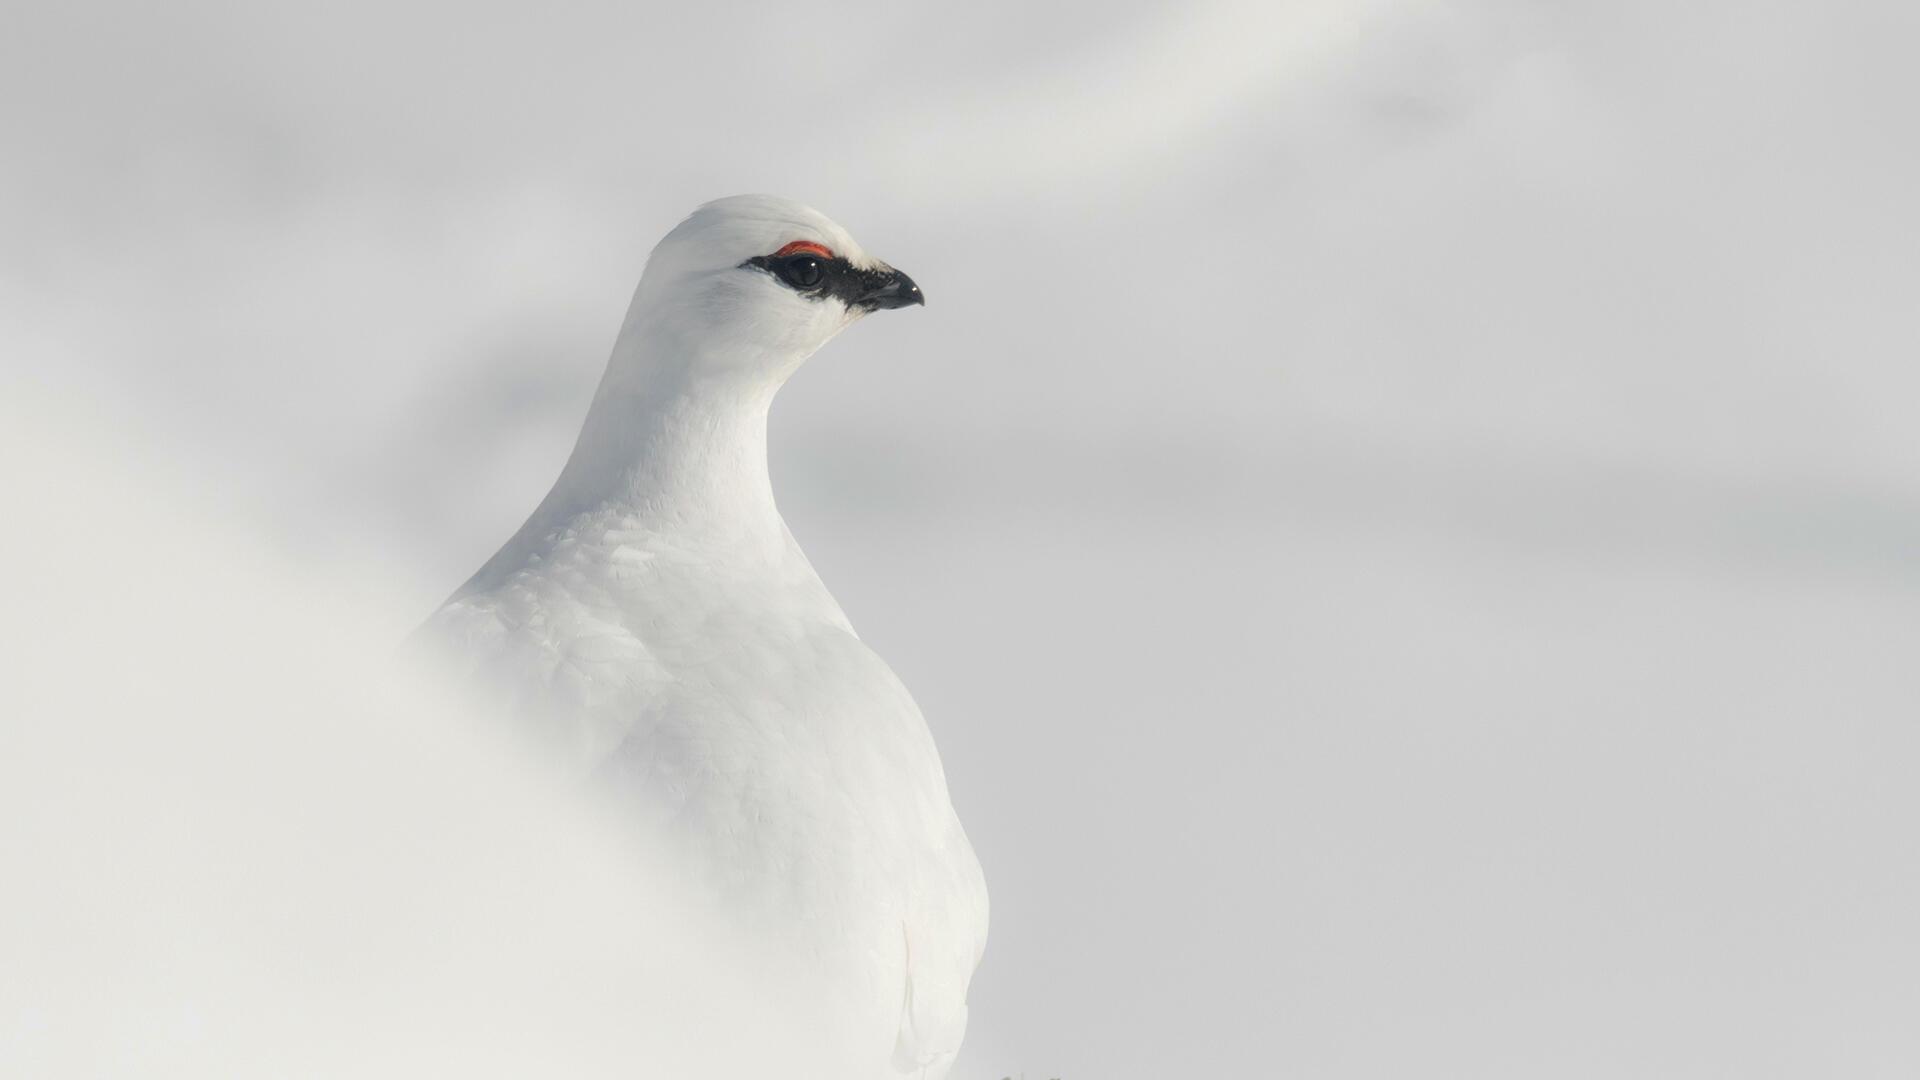 Lagopède alpin - perdrix des neiges - Bertrand Muffat-Joly - Alexis Bedu - Grand reportage